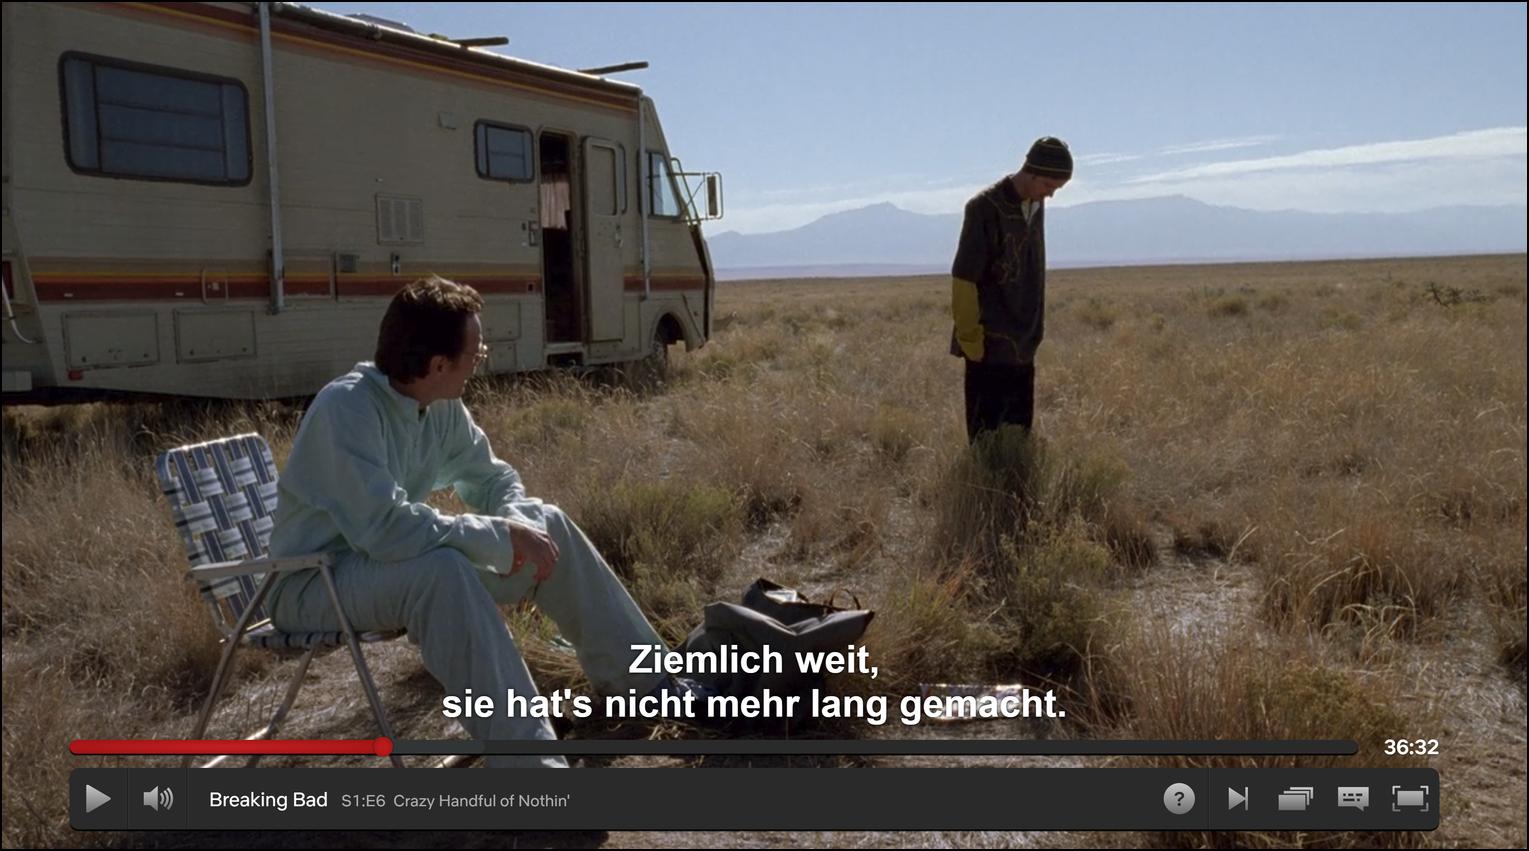 Watching Breaking Bad with German subtitles